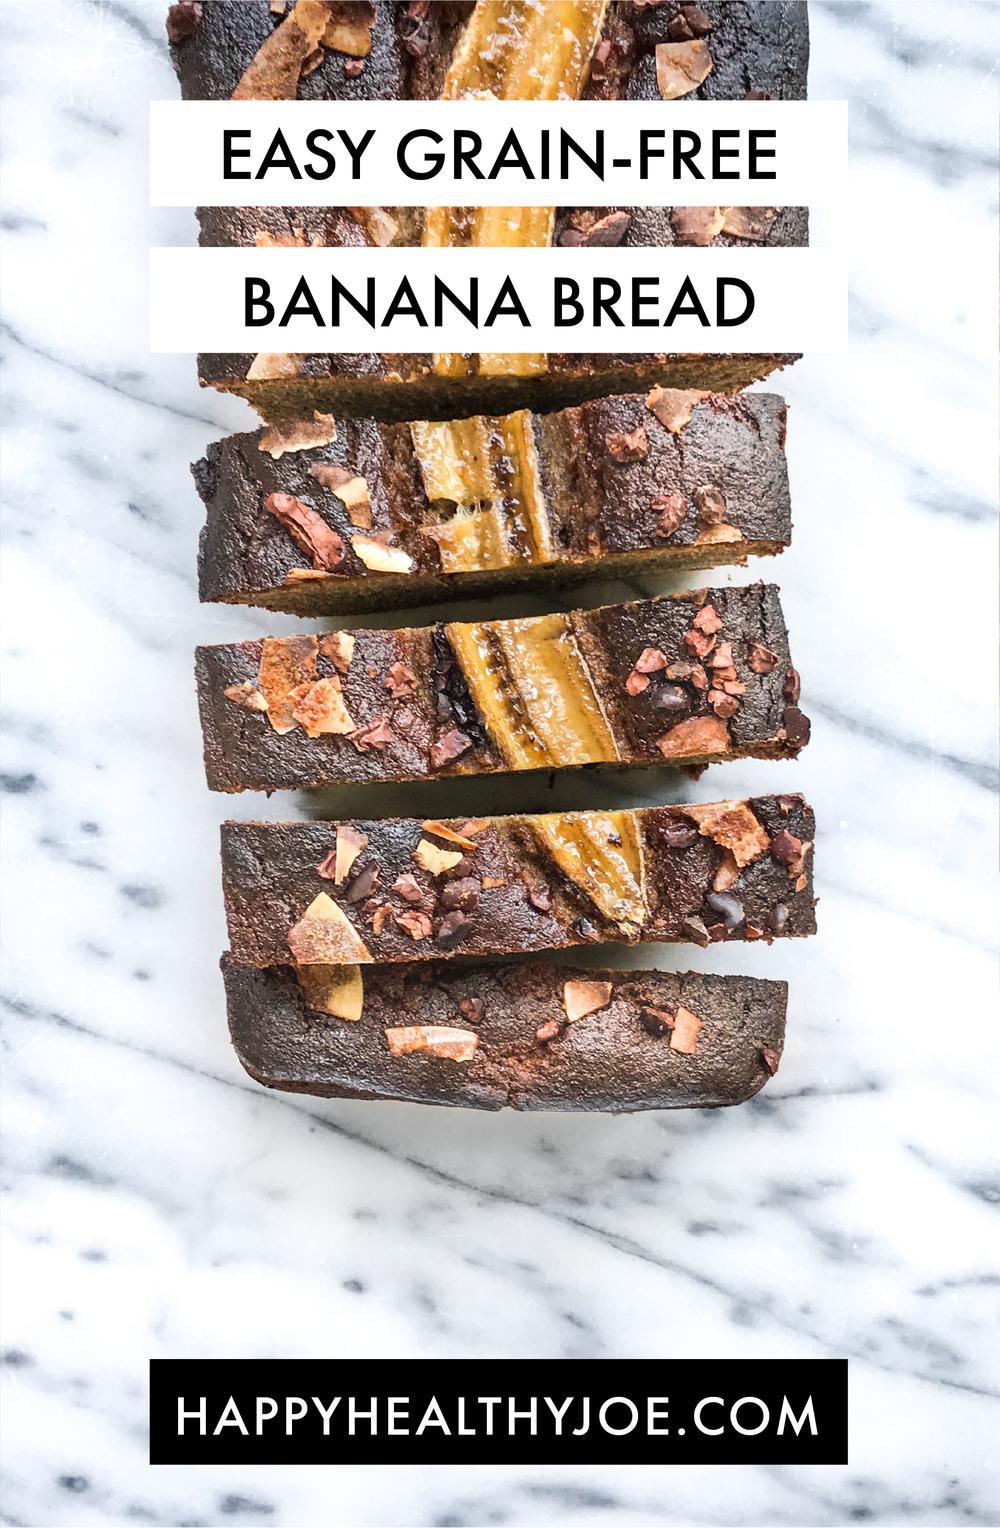 Easy Grain-Free Banana Bread-19.png